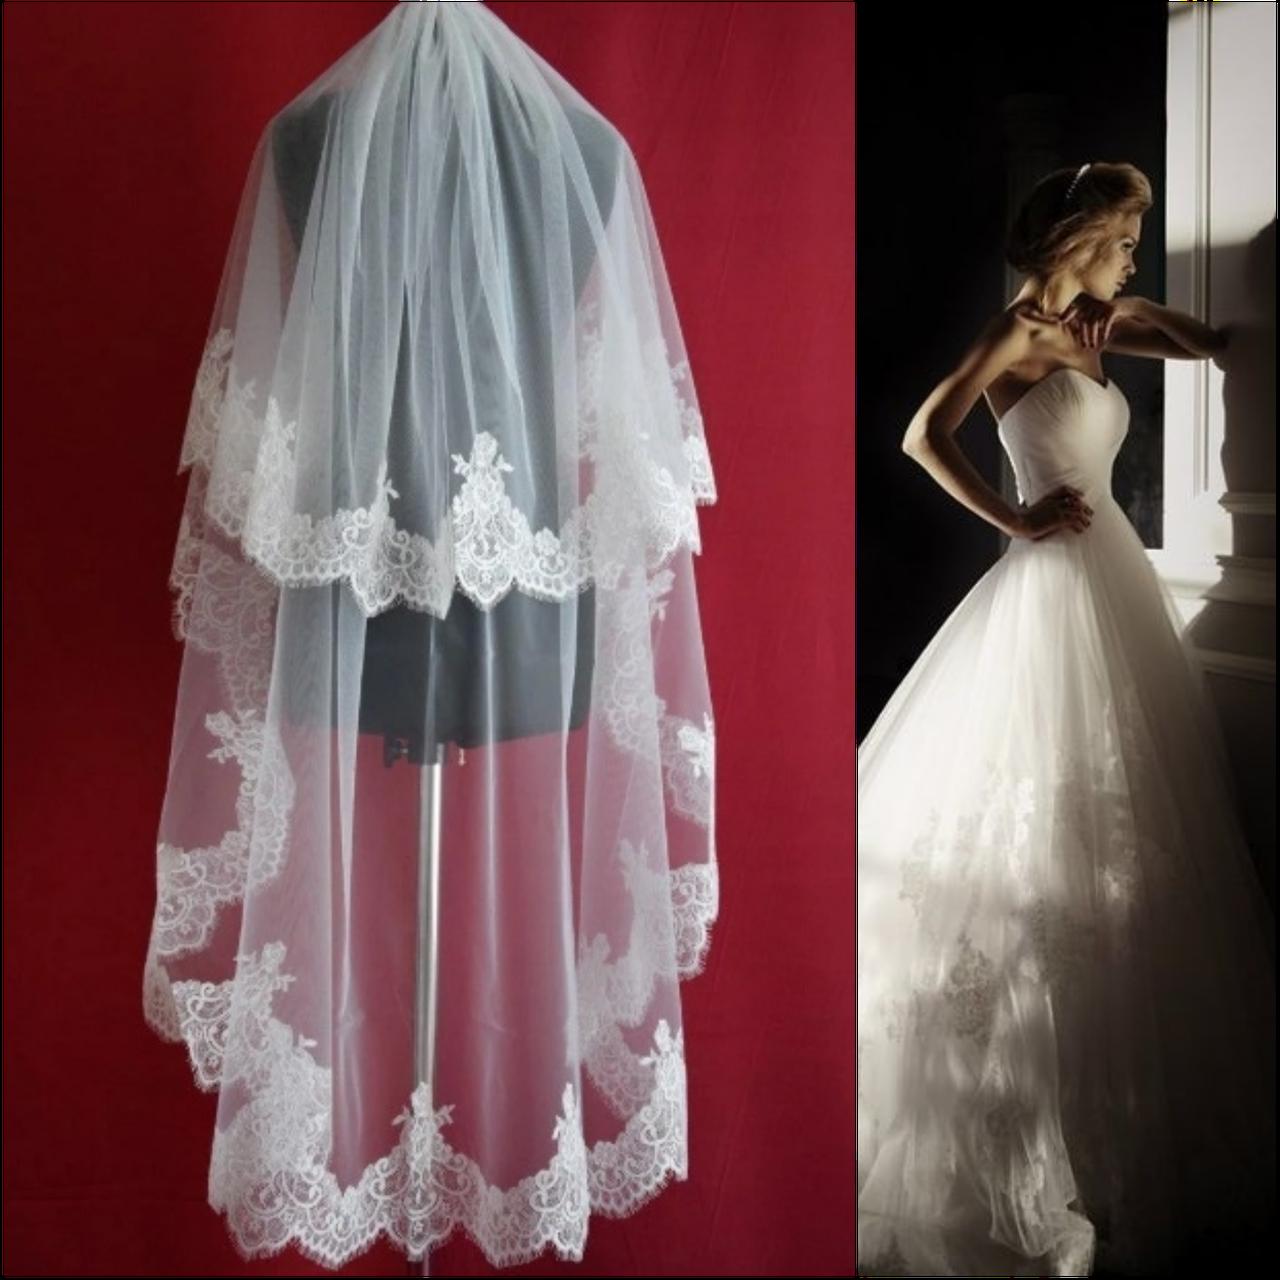 Вау! Двухъярусная удлиненная свадебная Фата ажурная SF для Невесты Белая/Айвори (sf-327)